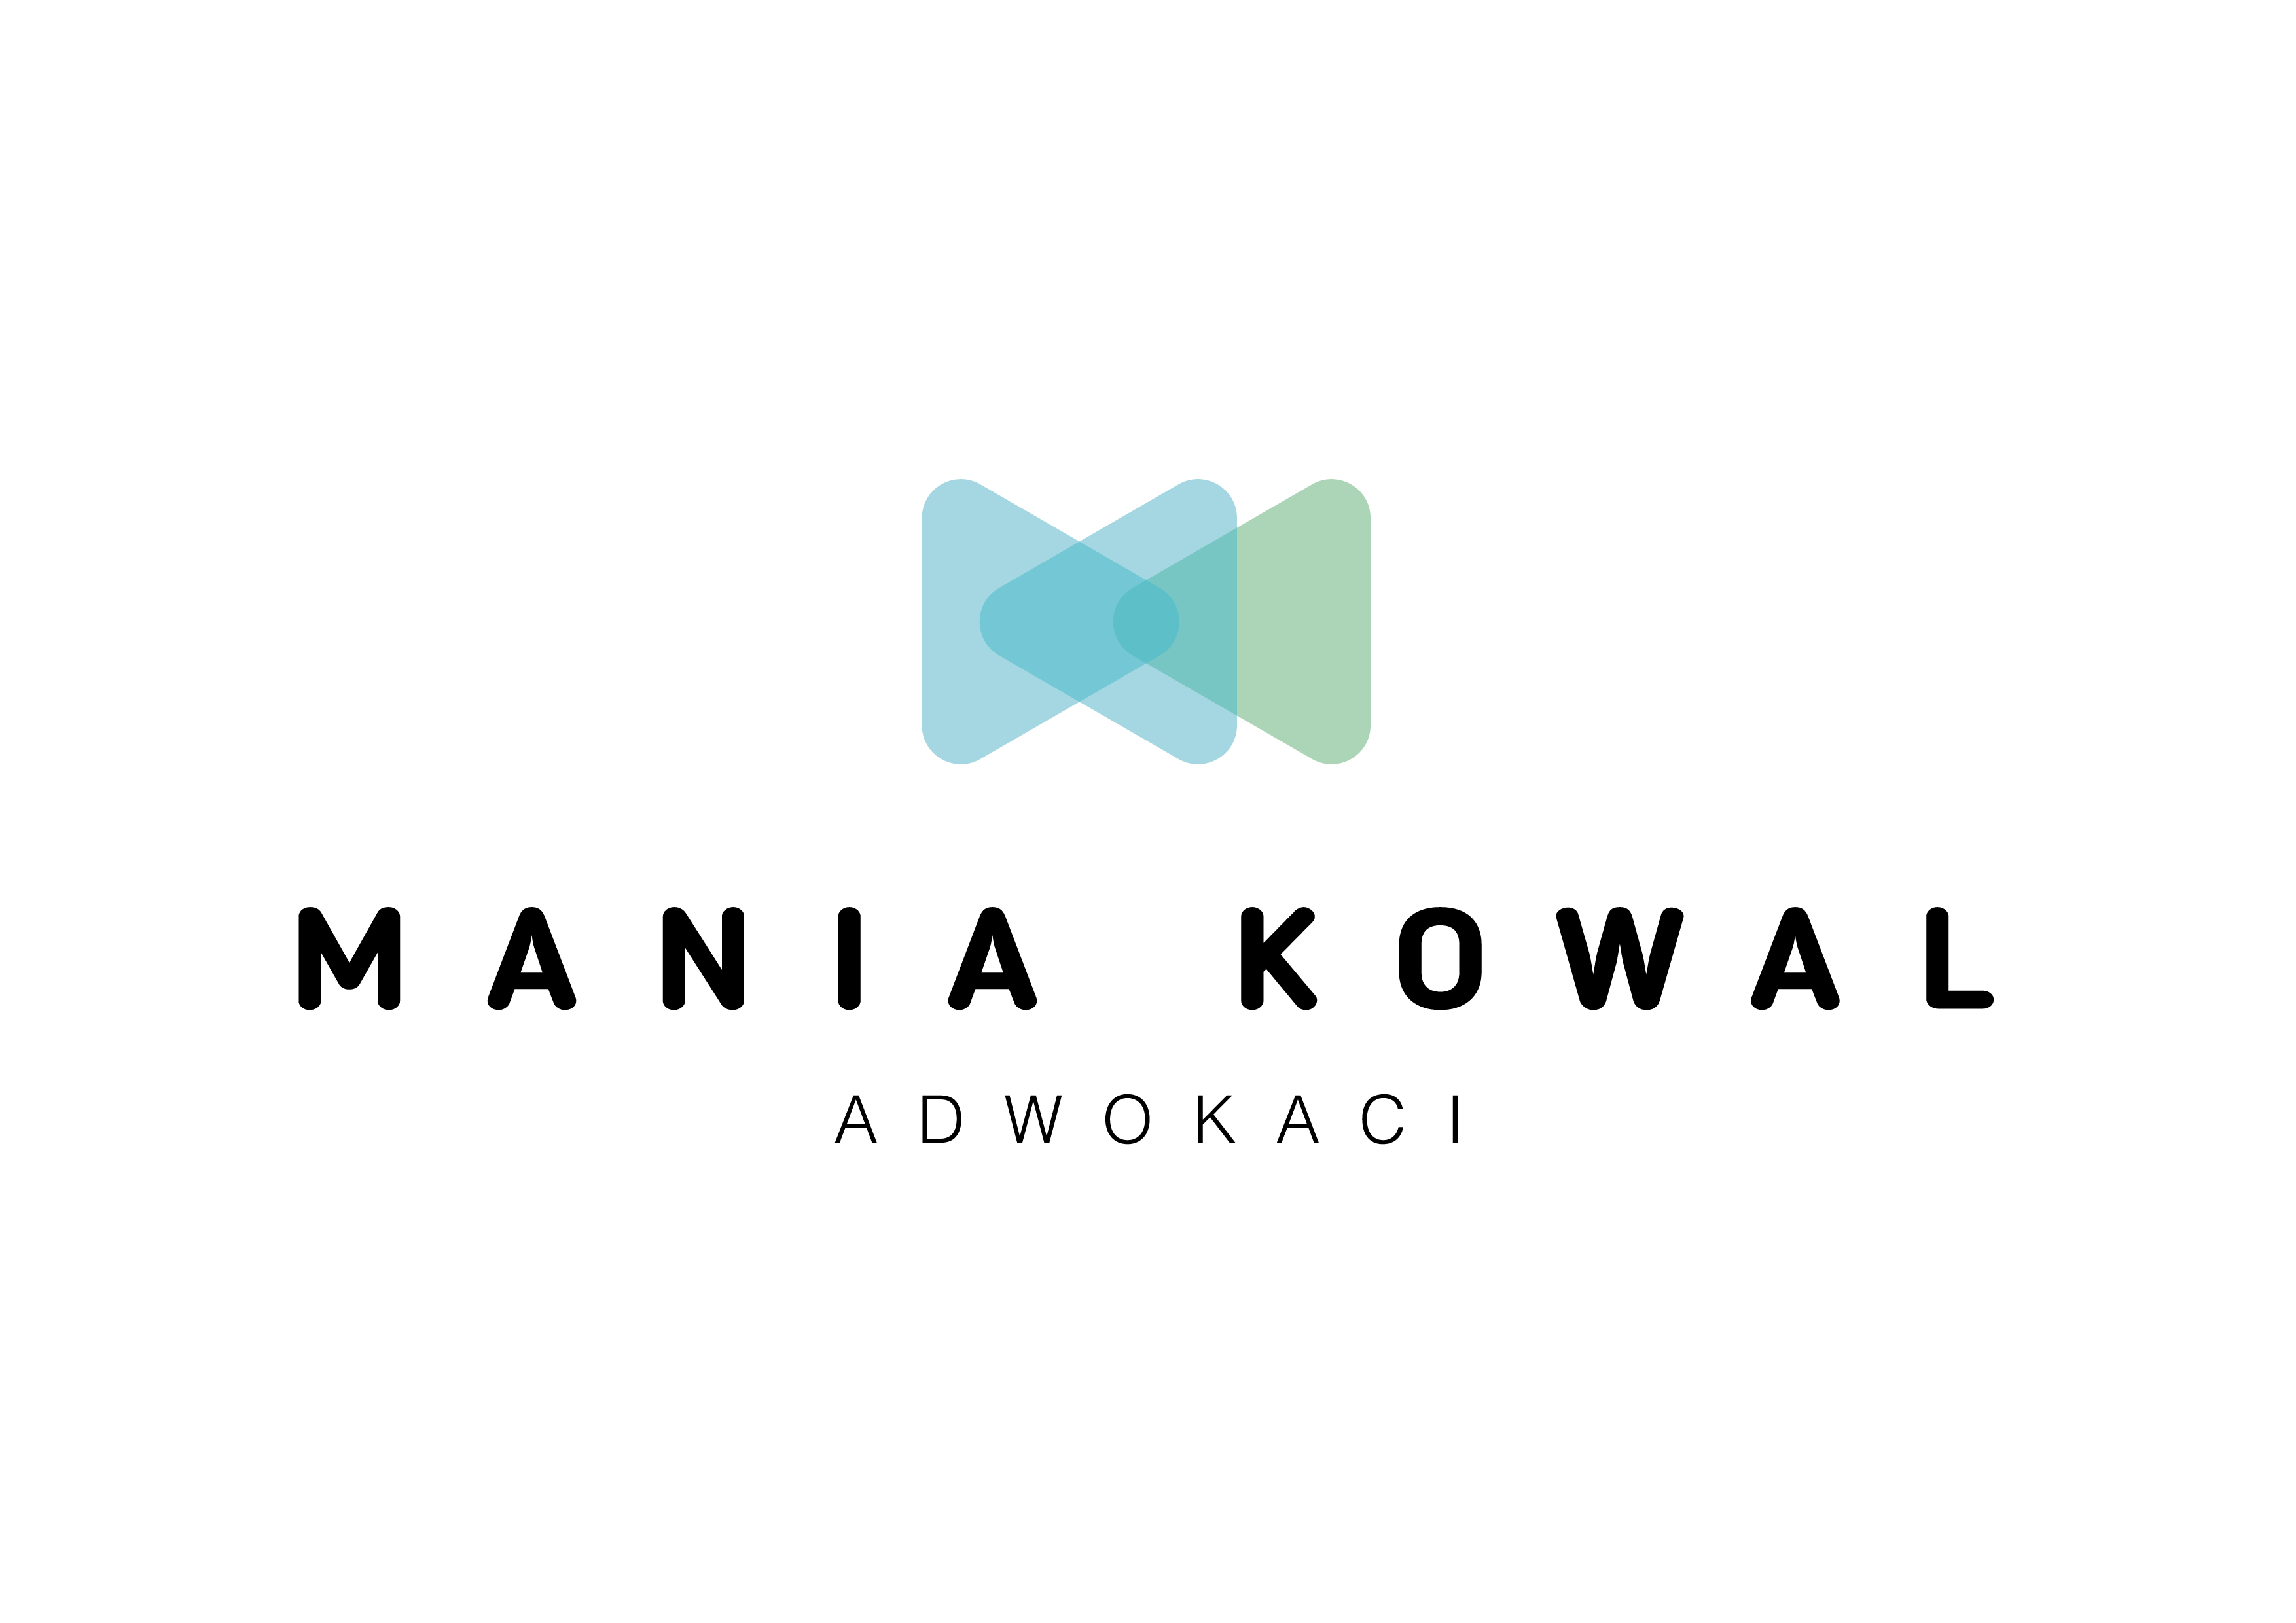 maniakowal-logo-01